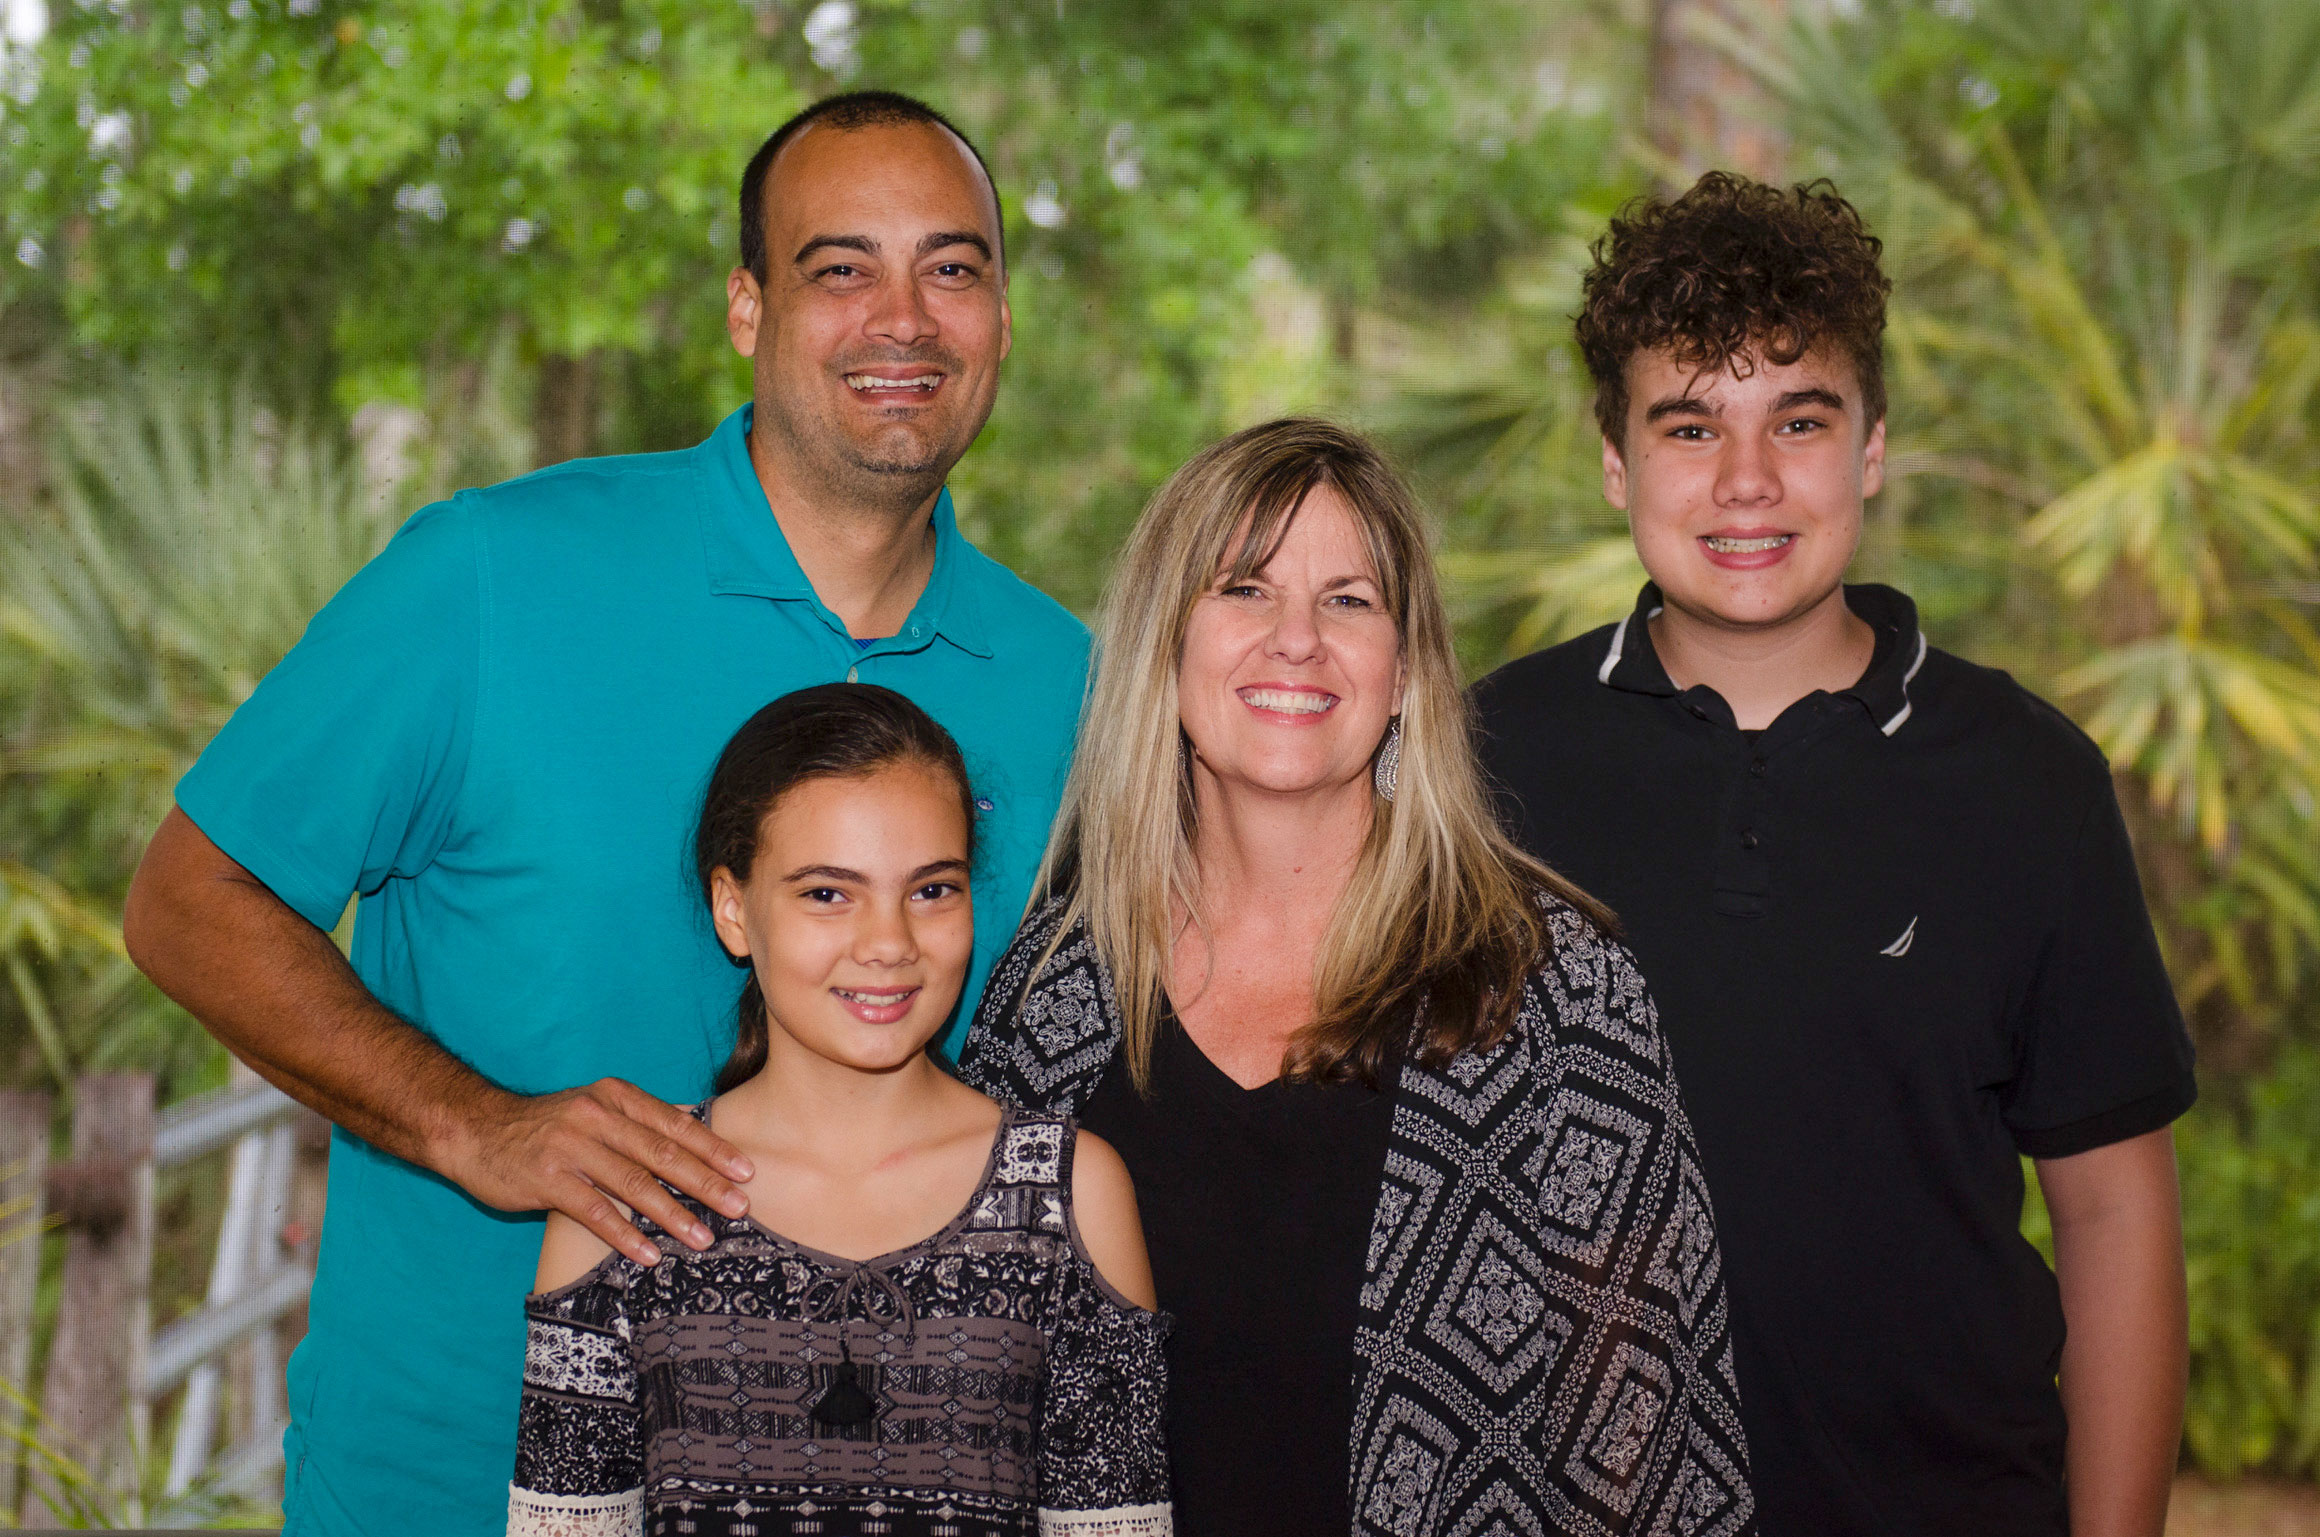 Pastor Chris Tress & His Family